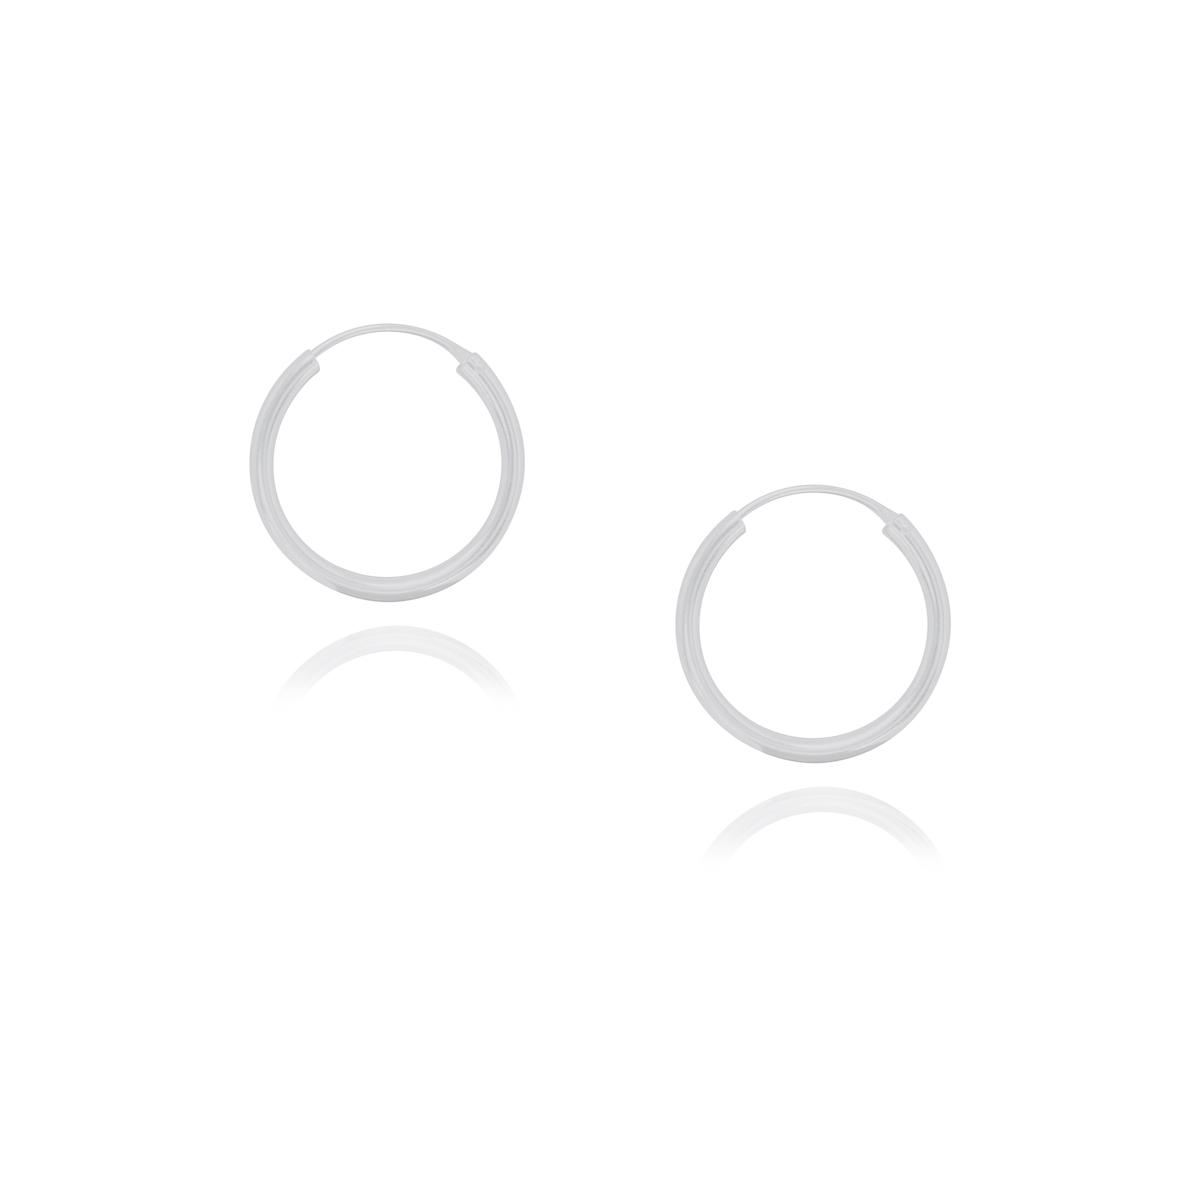 Argola joia em prata de lei 925 maciça hipoalergênica fina